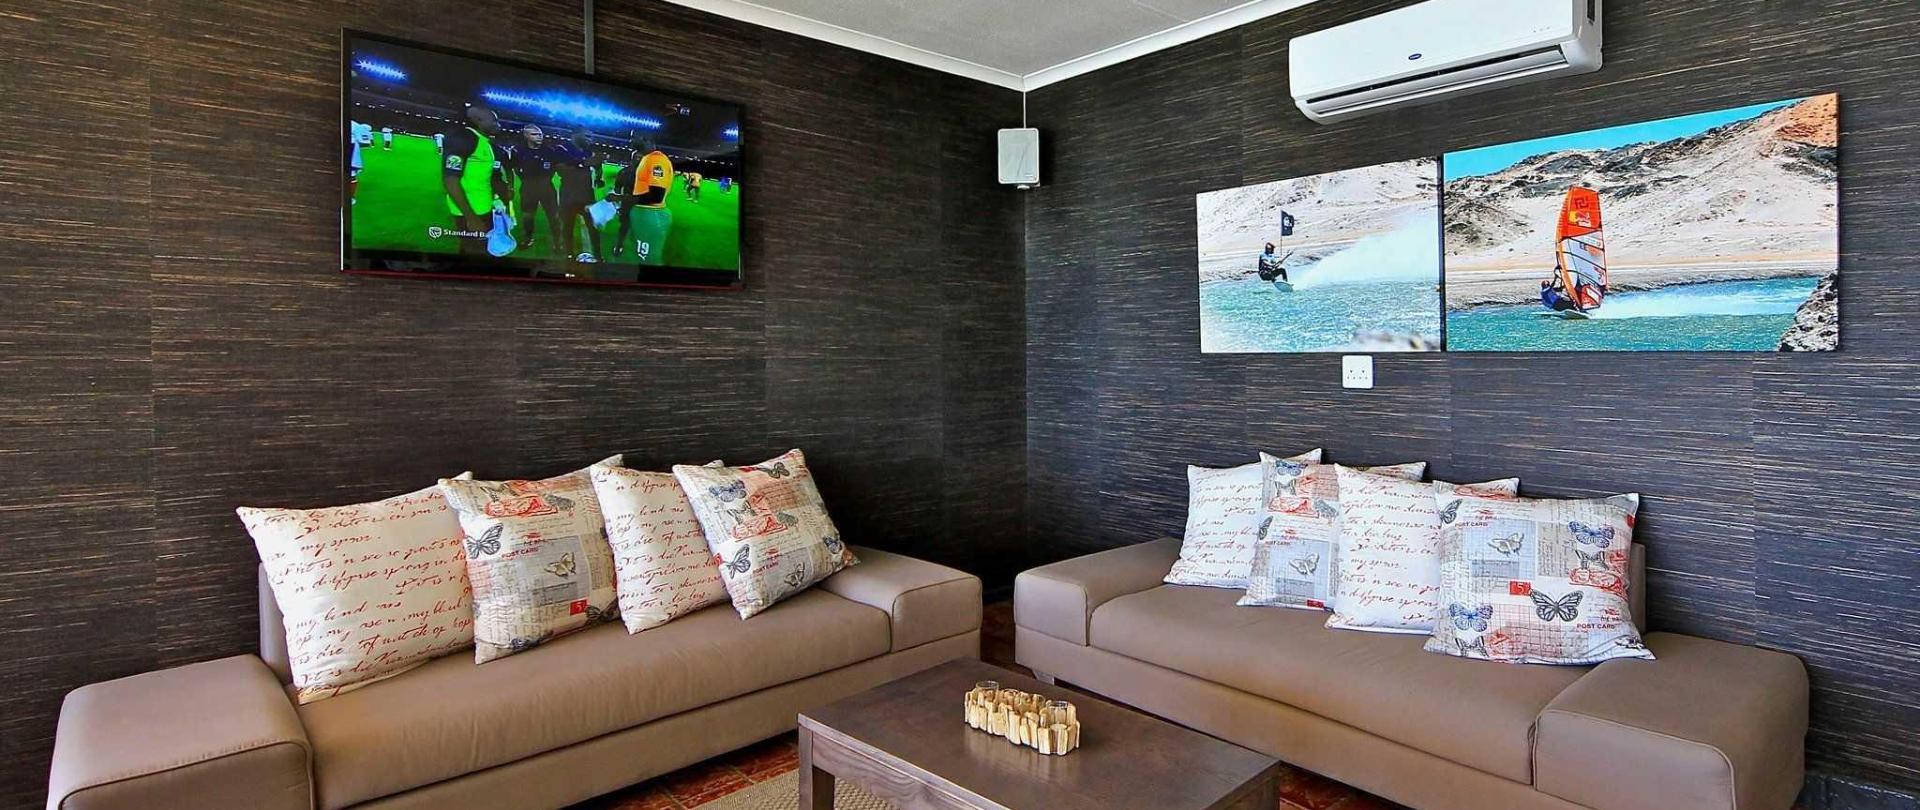 nest-hotel-crayfish-bar-lounge-hd-tv-2016.jpg